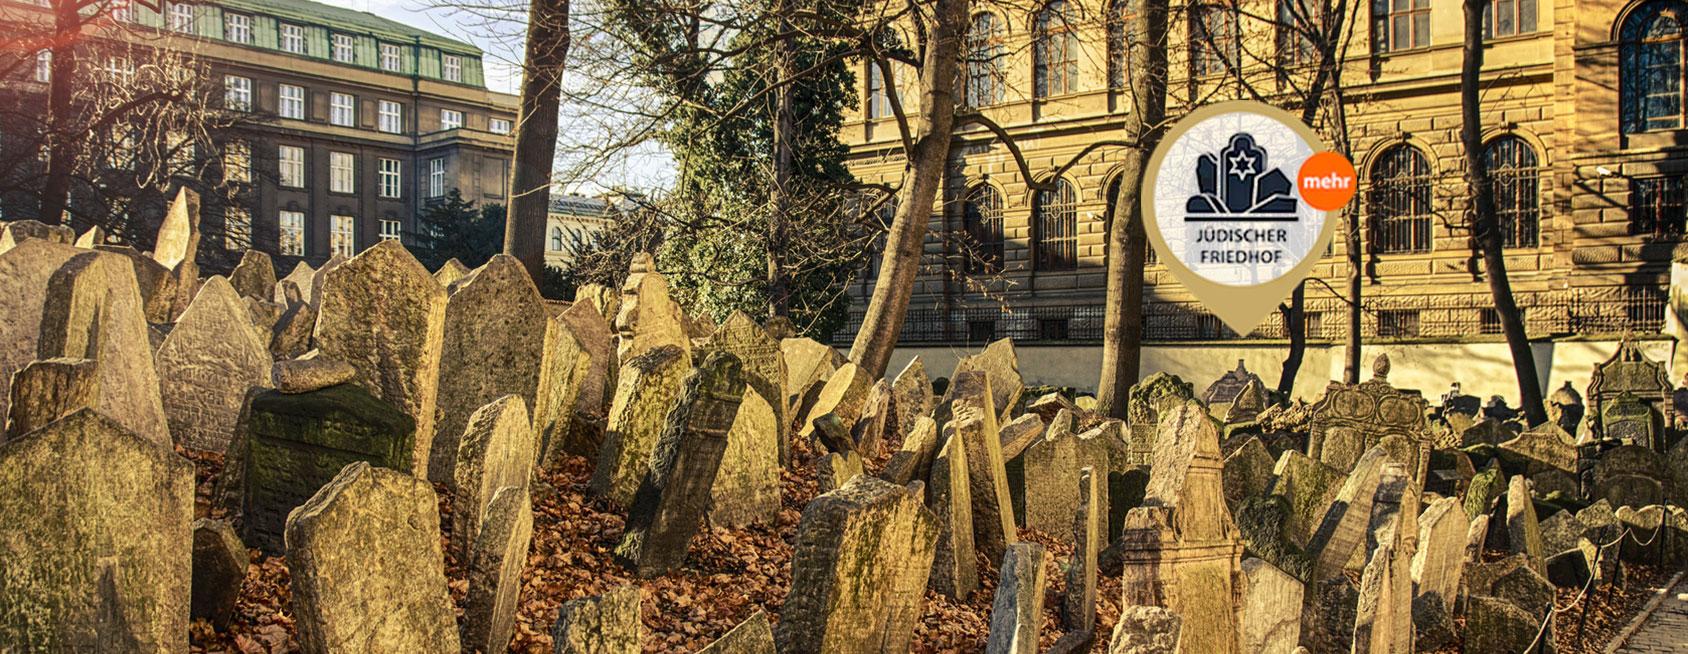 Juedischer Friedhof Prag